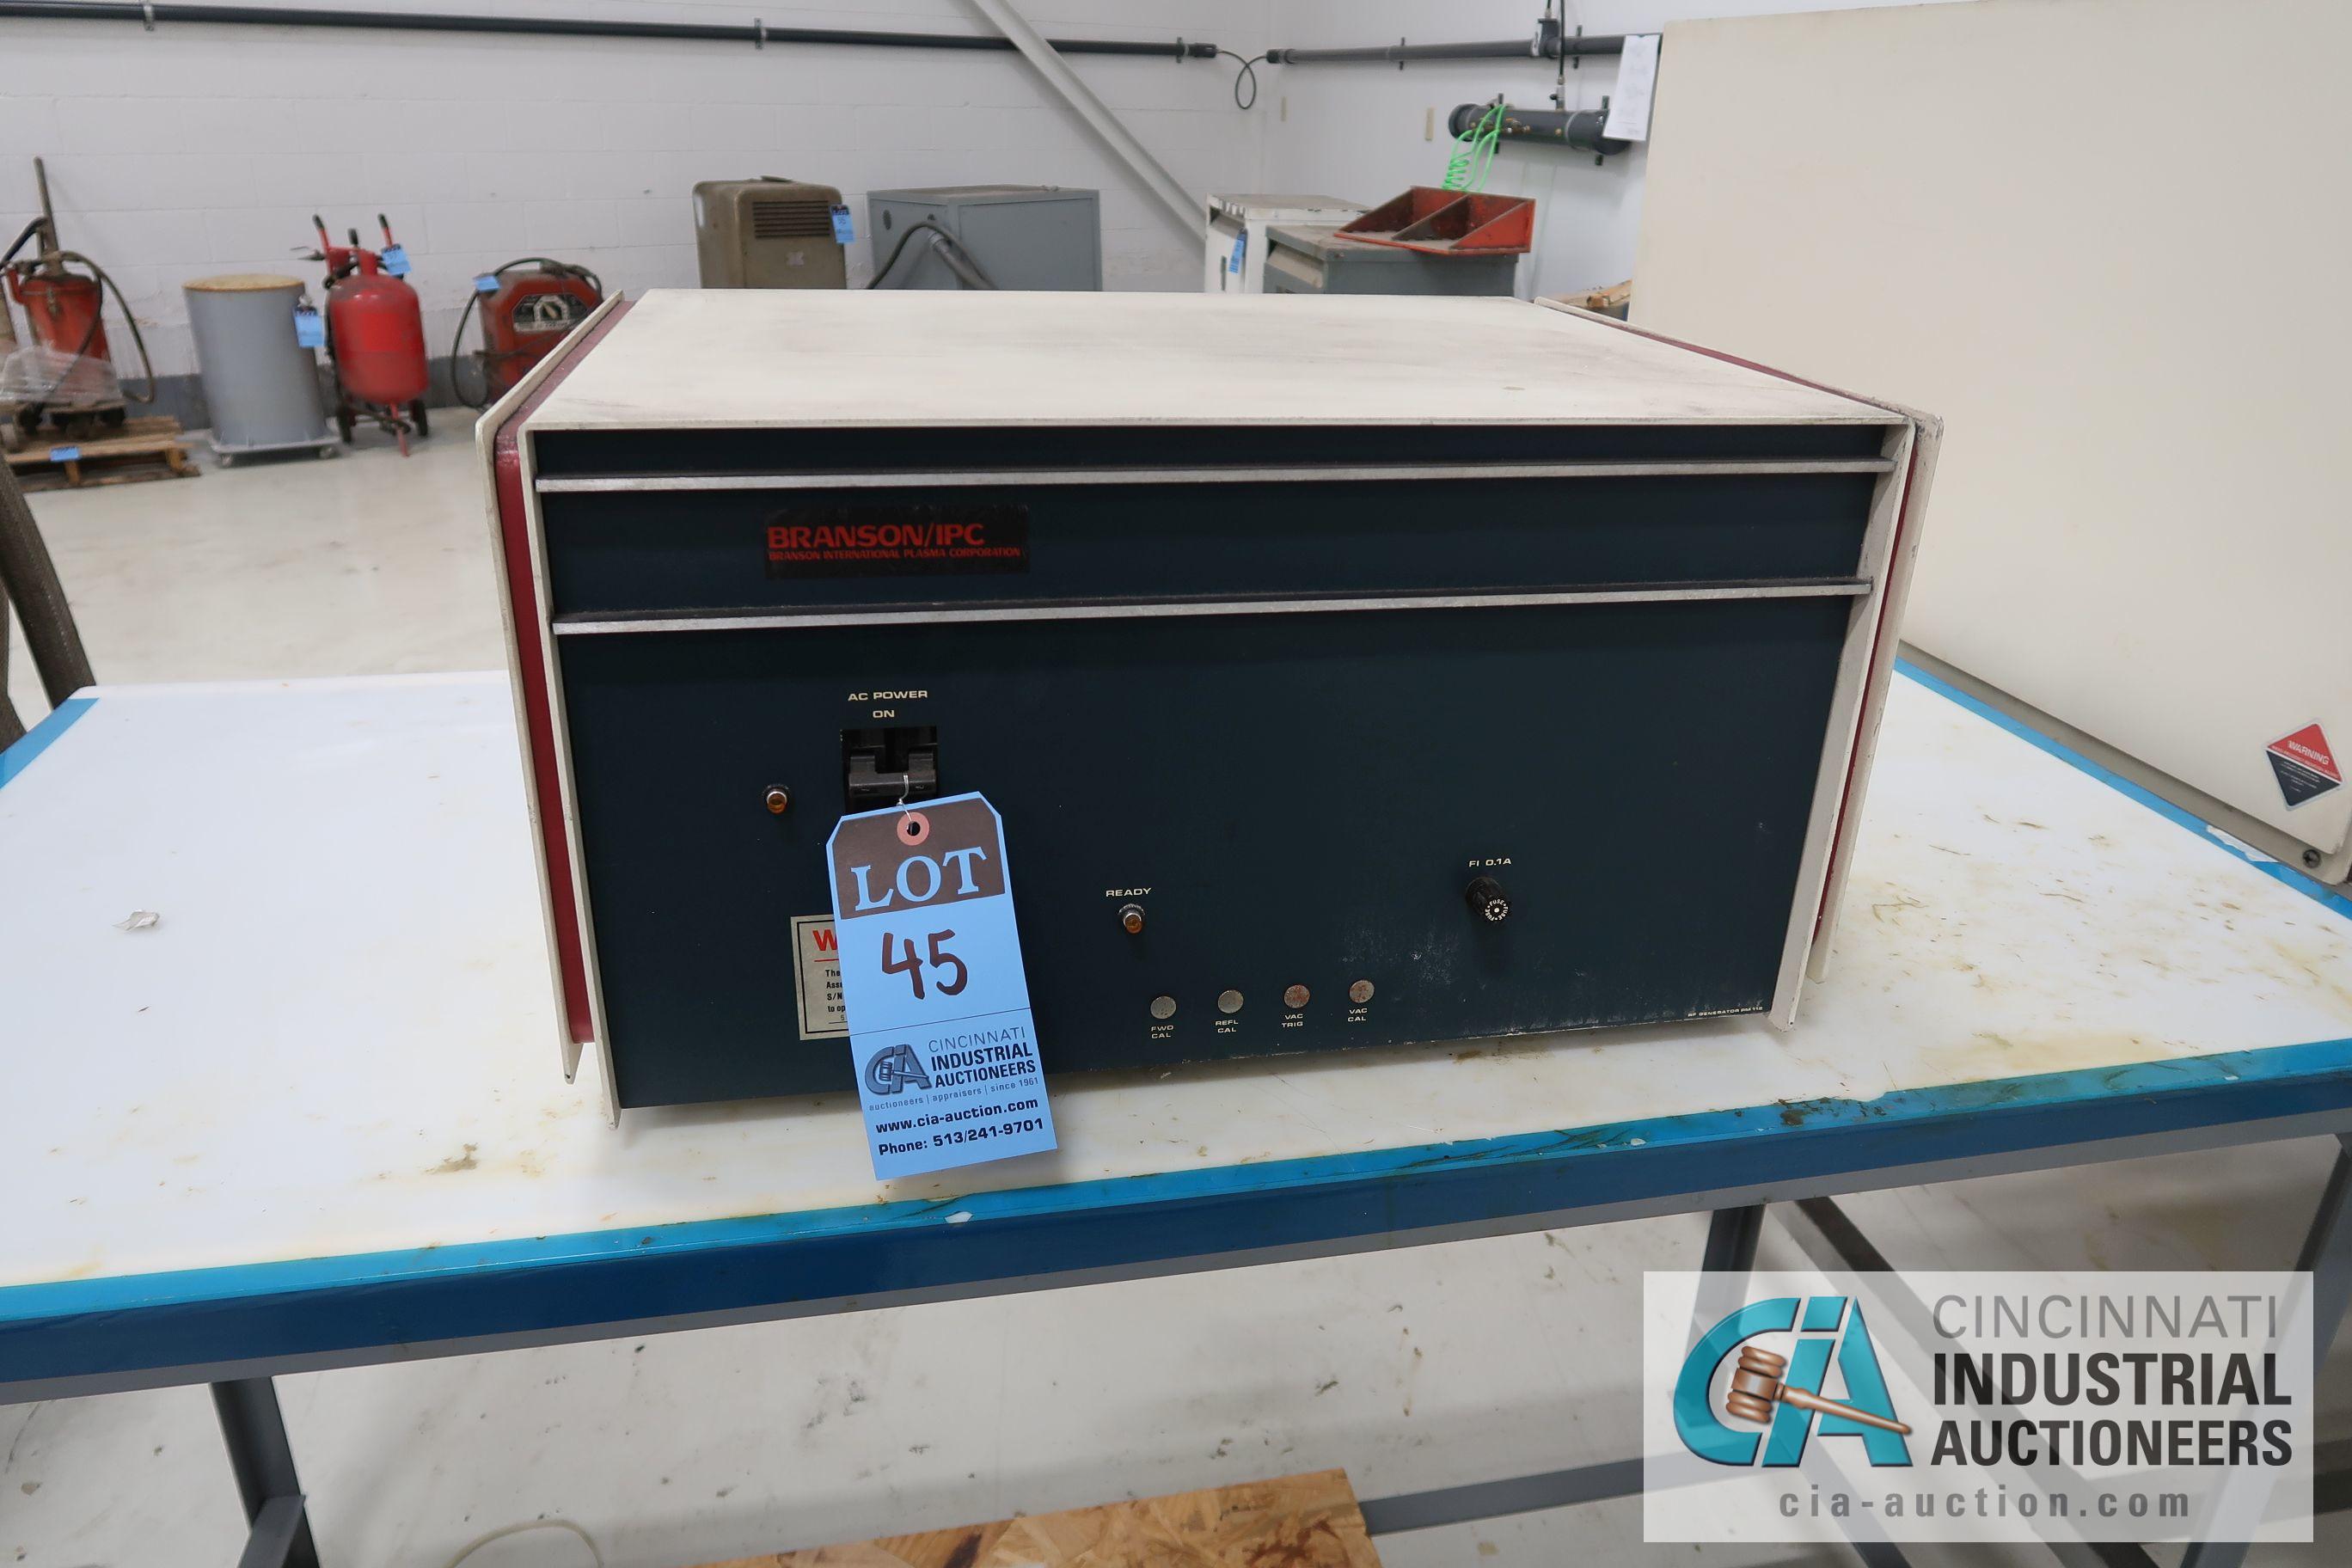 BRANSON PM112 GENERATOR; S/N 10004882